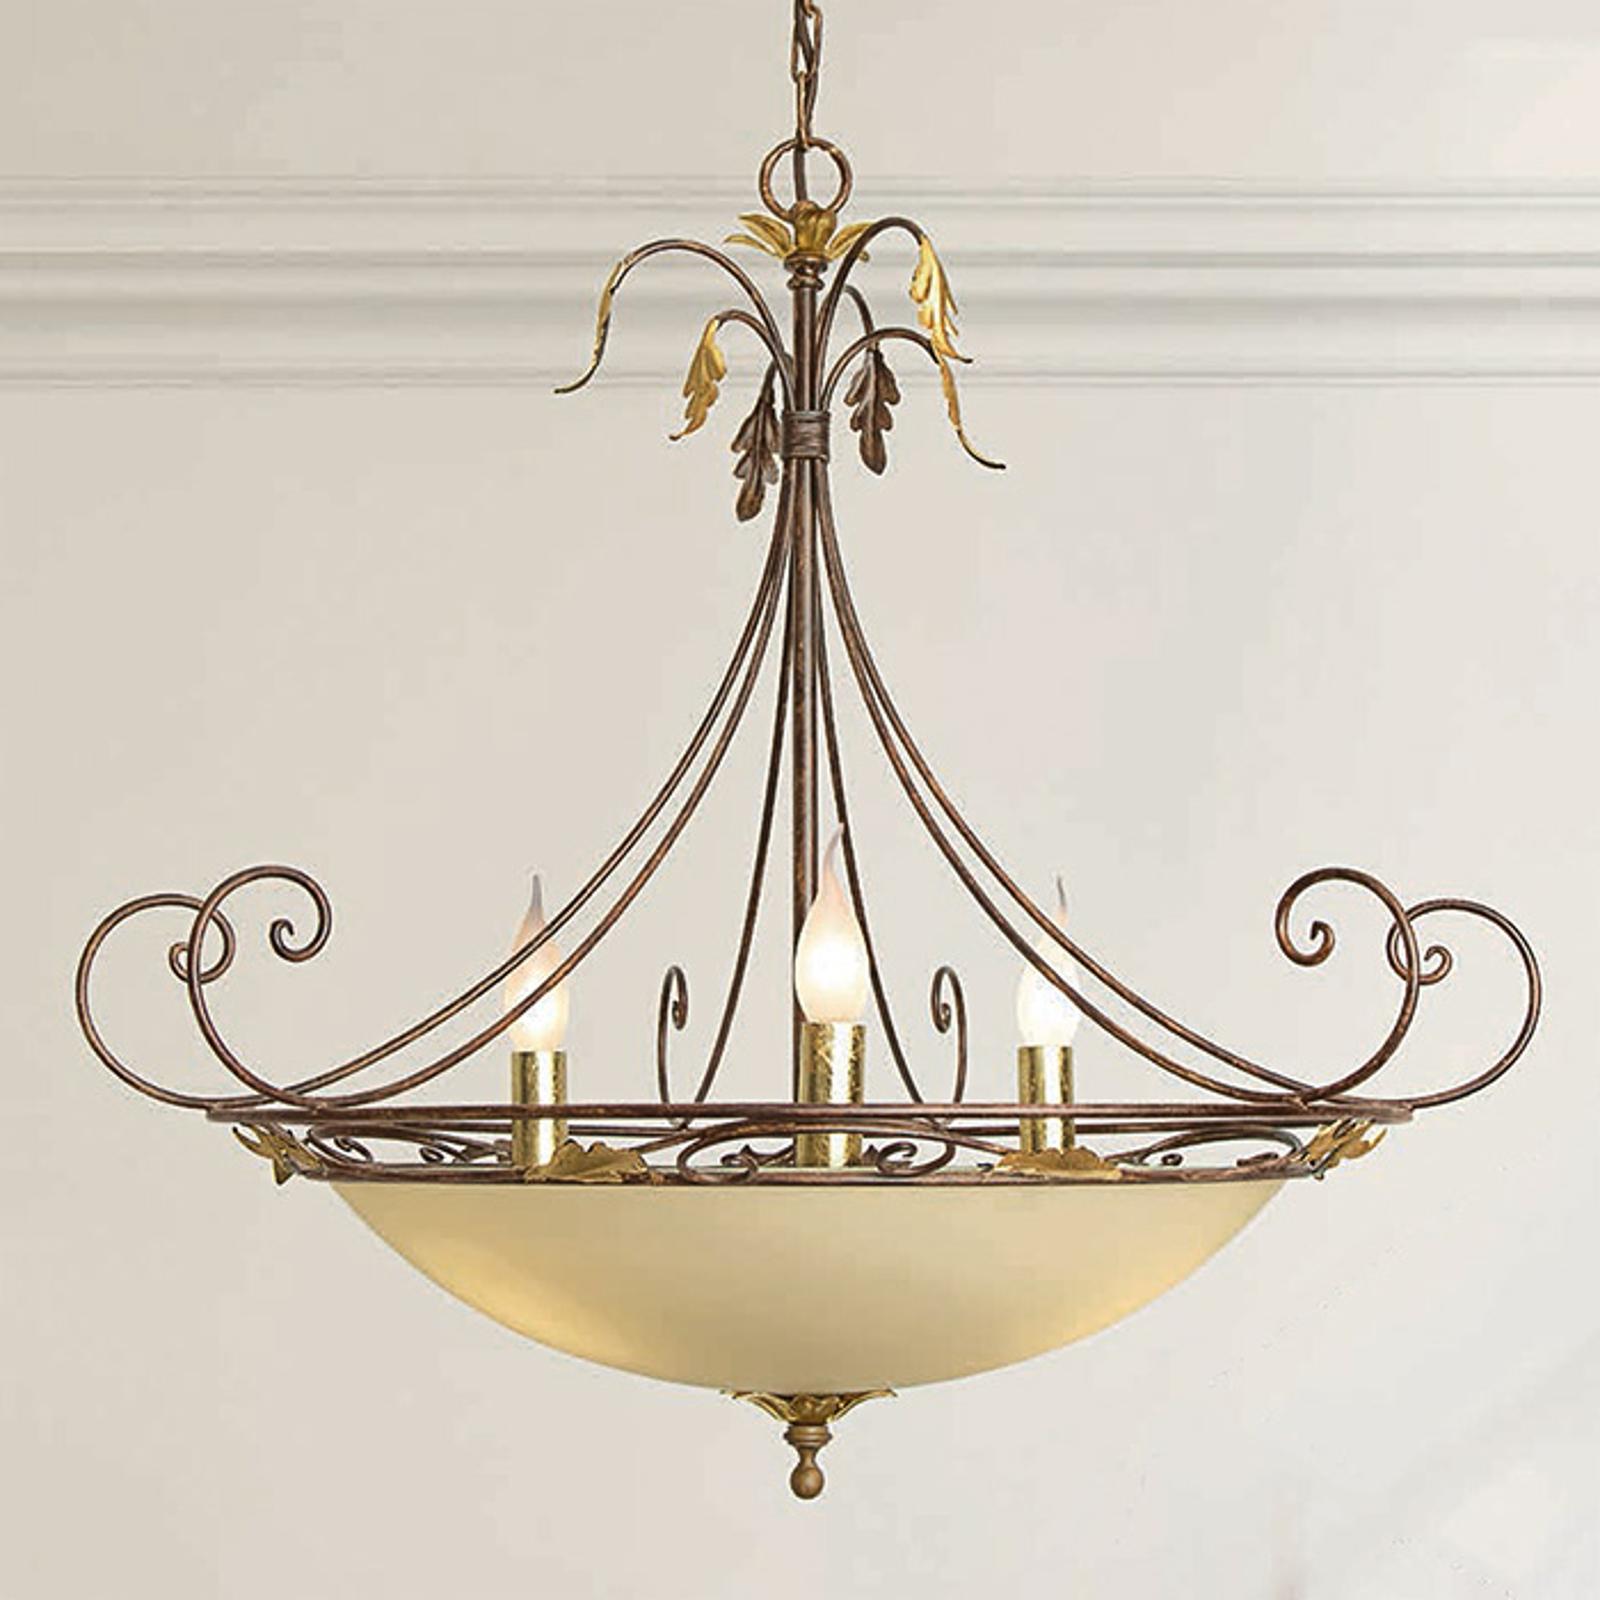 Weelderige hanglamp Damiano